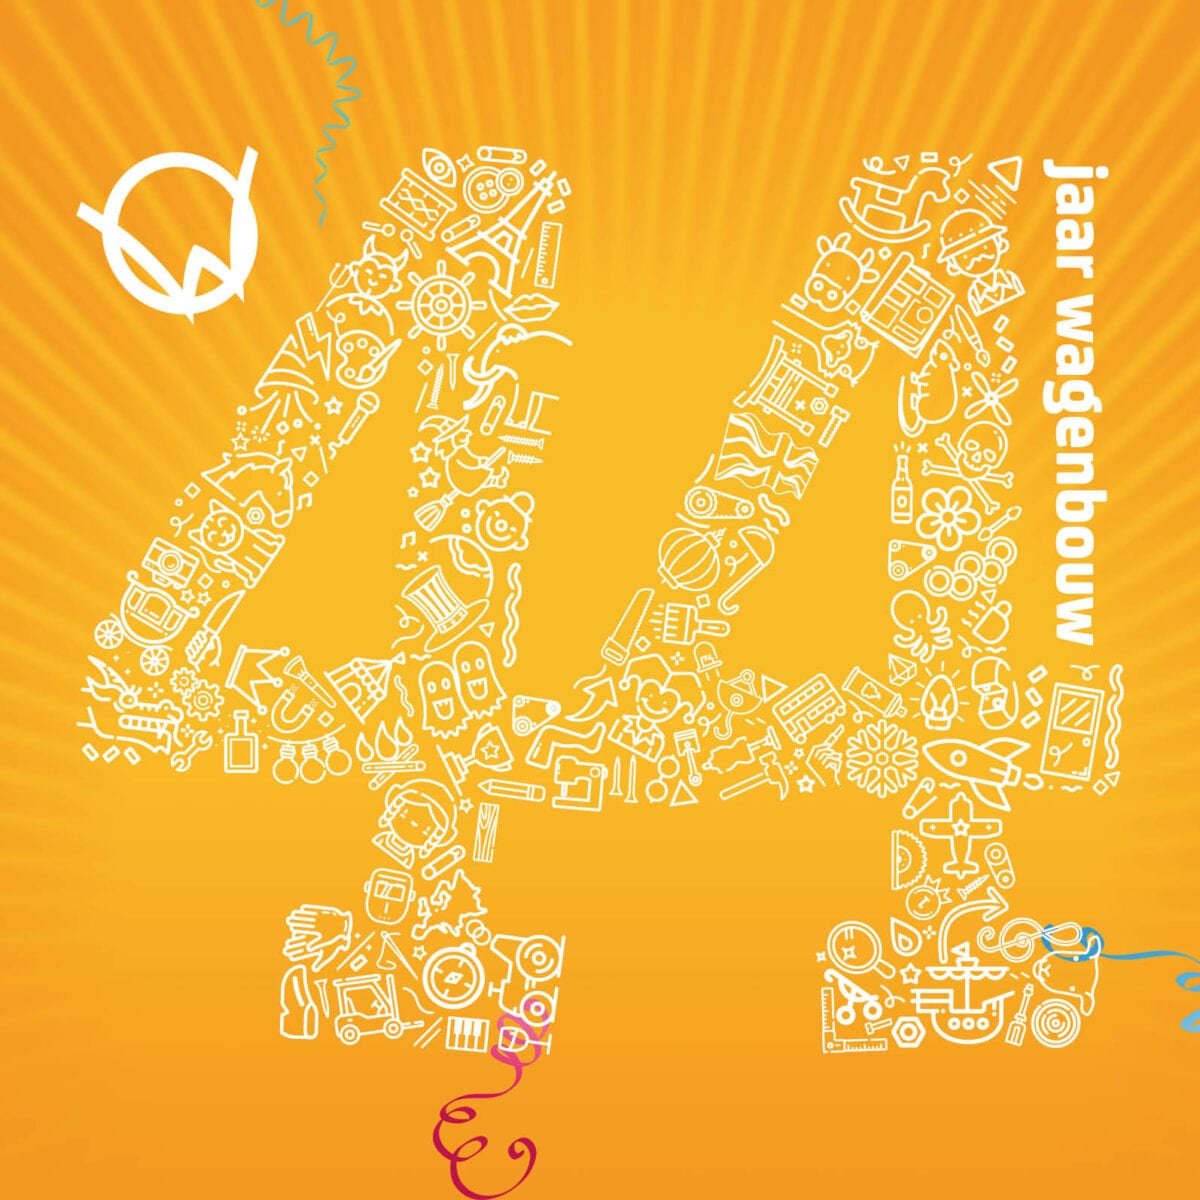 Jubileumweekend_Uitnodiging_Oranjewijk_digitaal